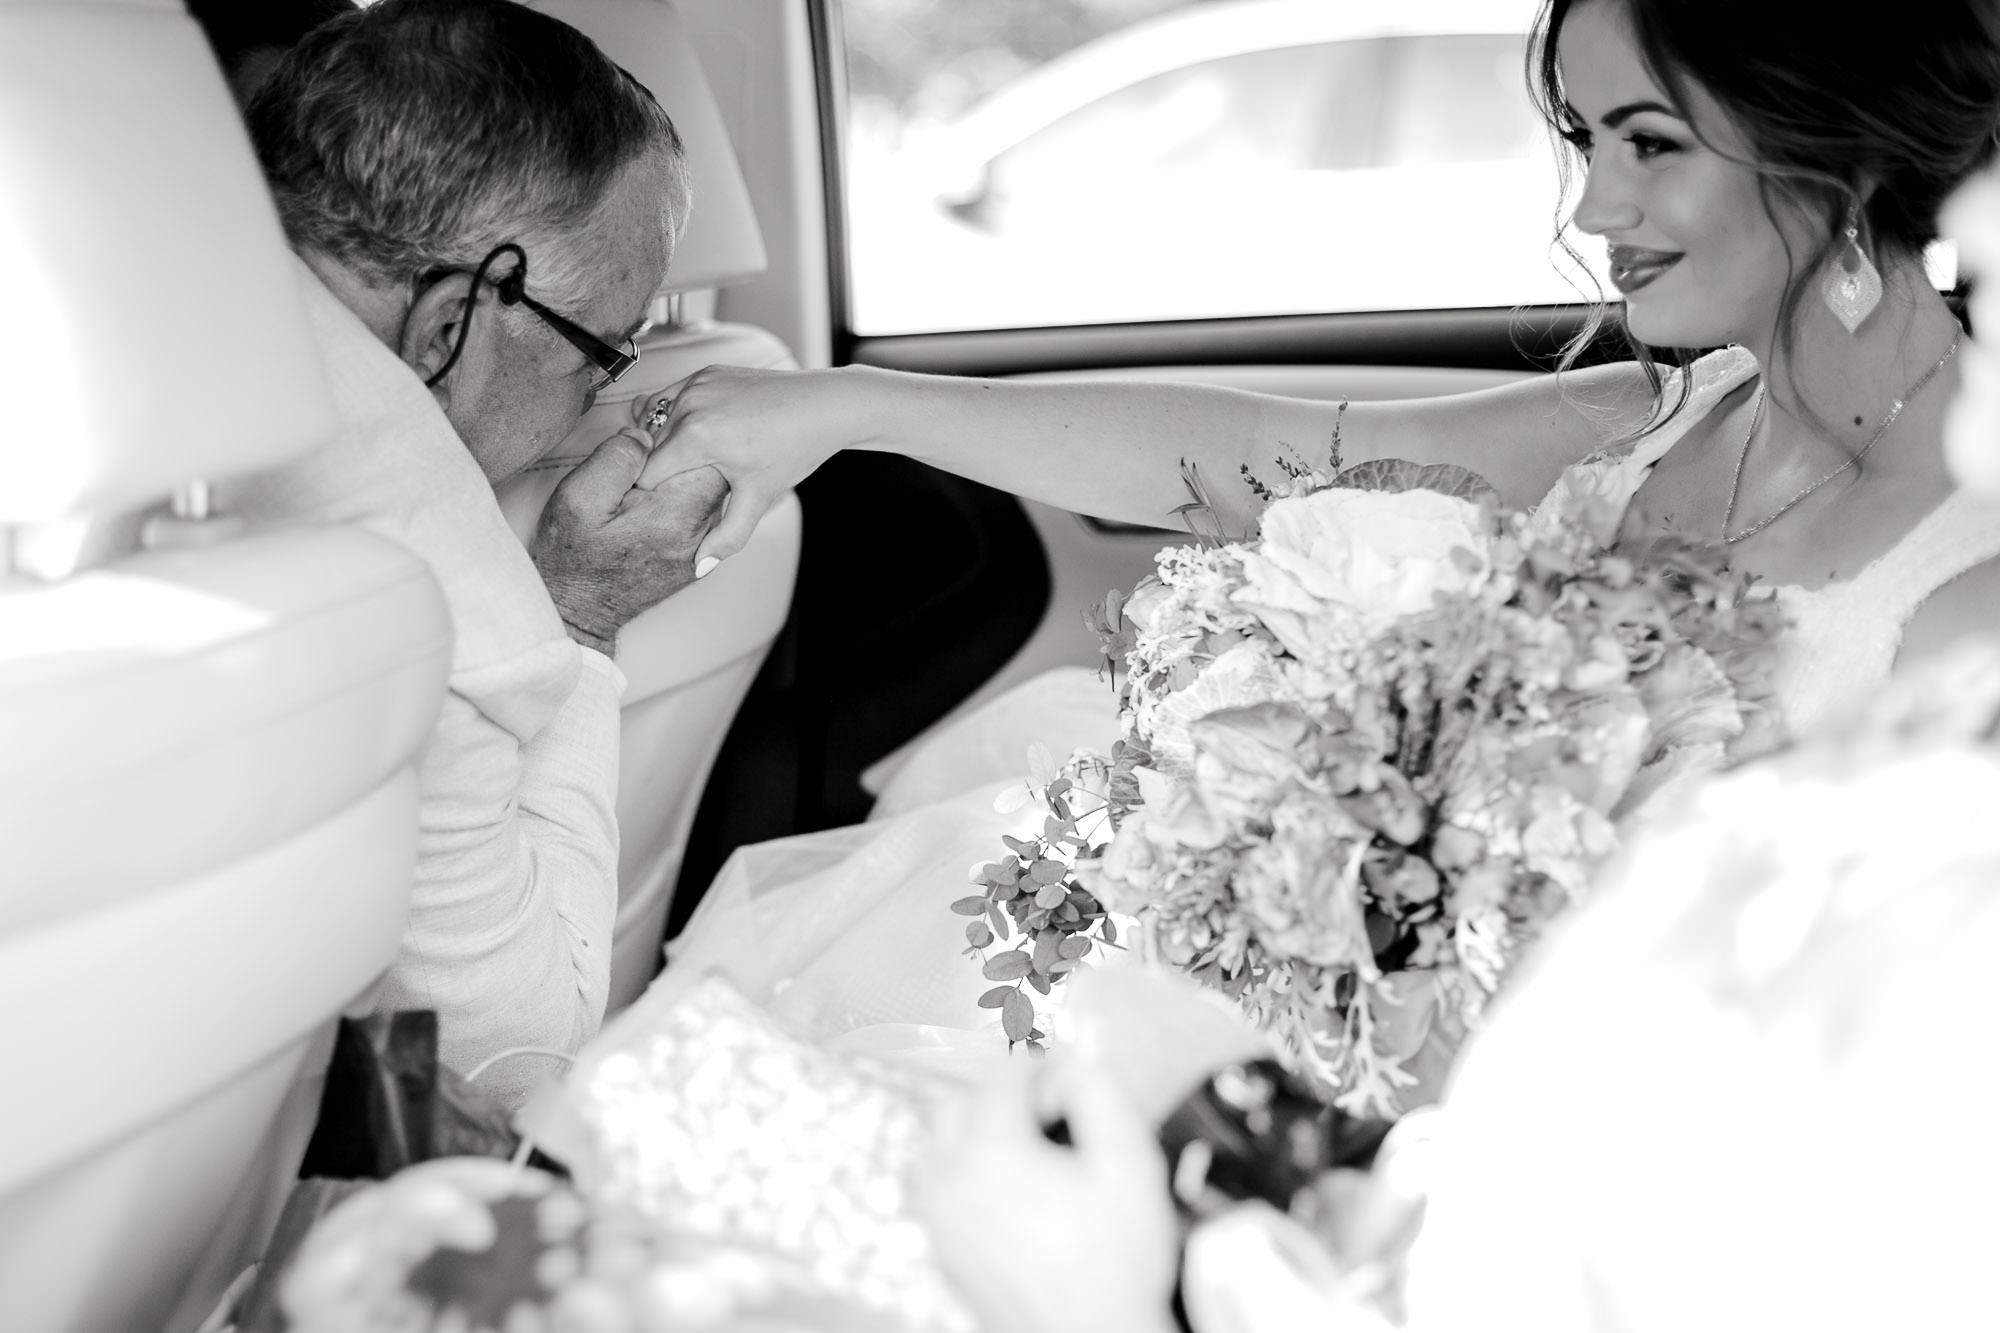 alexis-joel-laury-lubbock-weddingphotographer-alleej0016.jpg